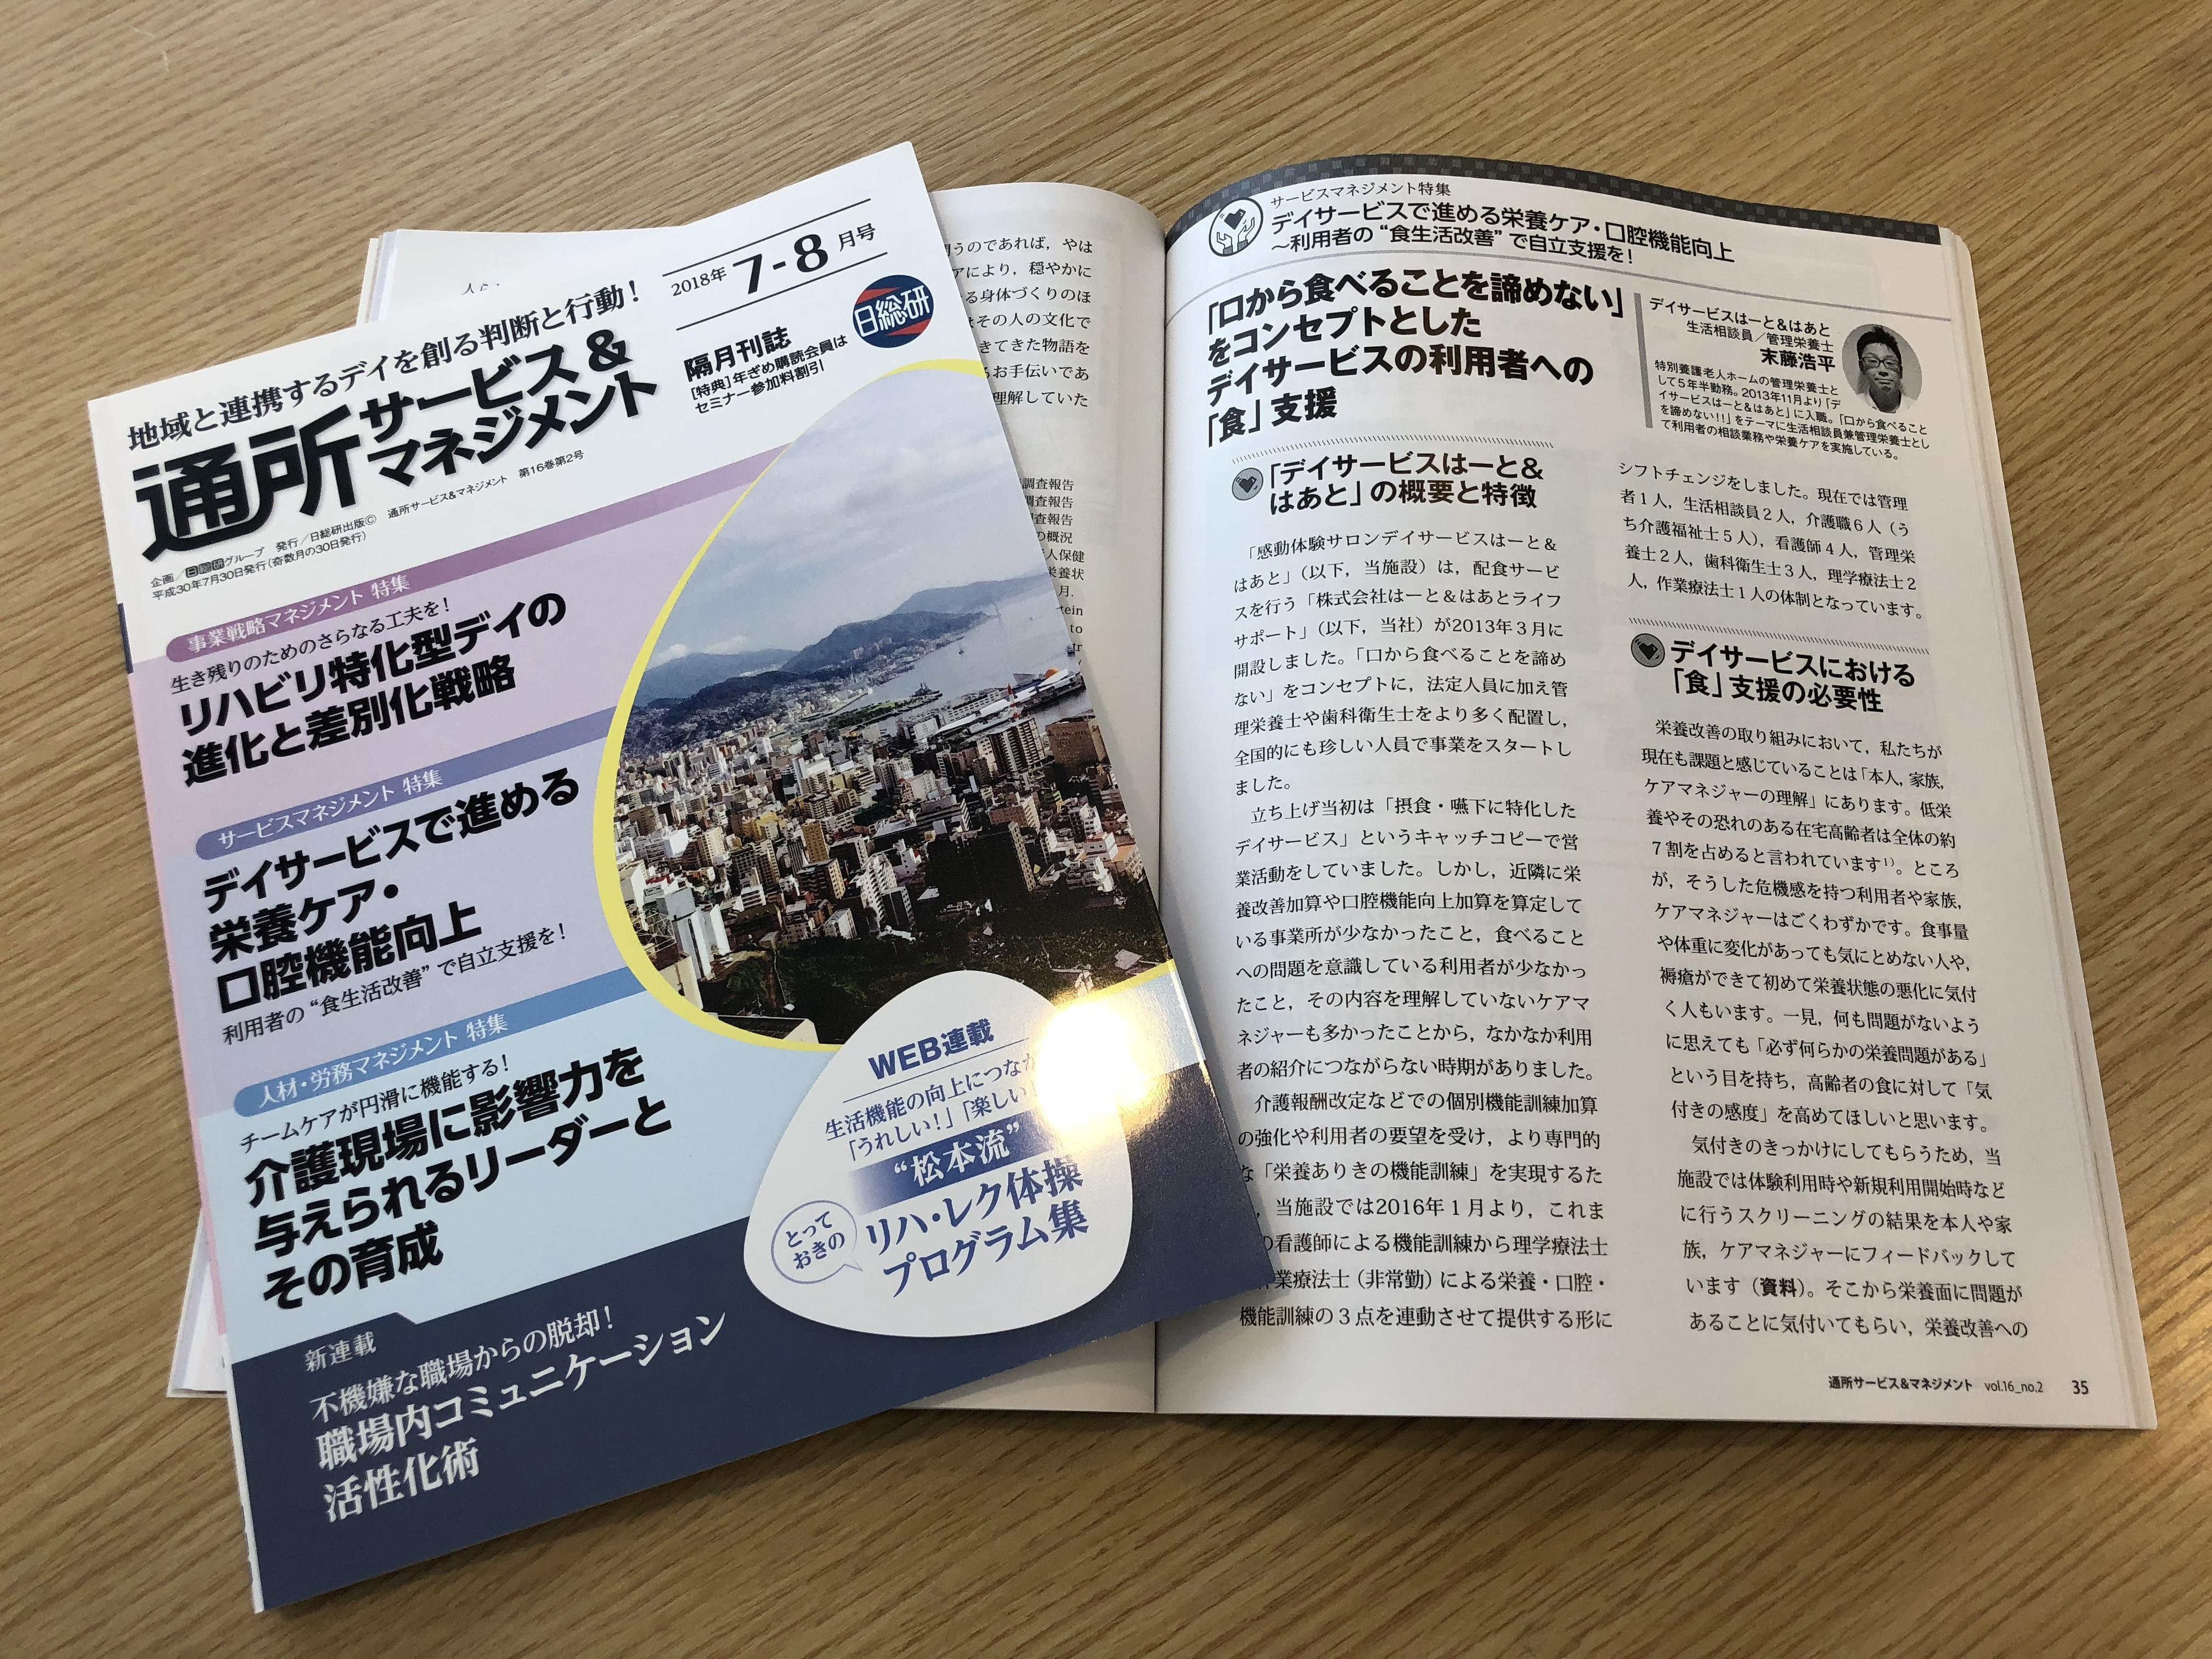 http://www.810810.co.jp/blog_run7/%E5%86%99%E7%9C%9F%202018-07-20%2014%2045%2046.jpg